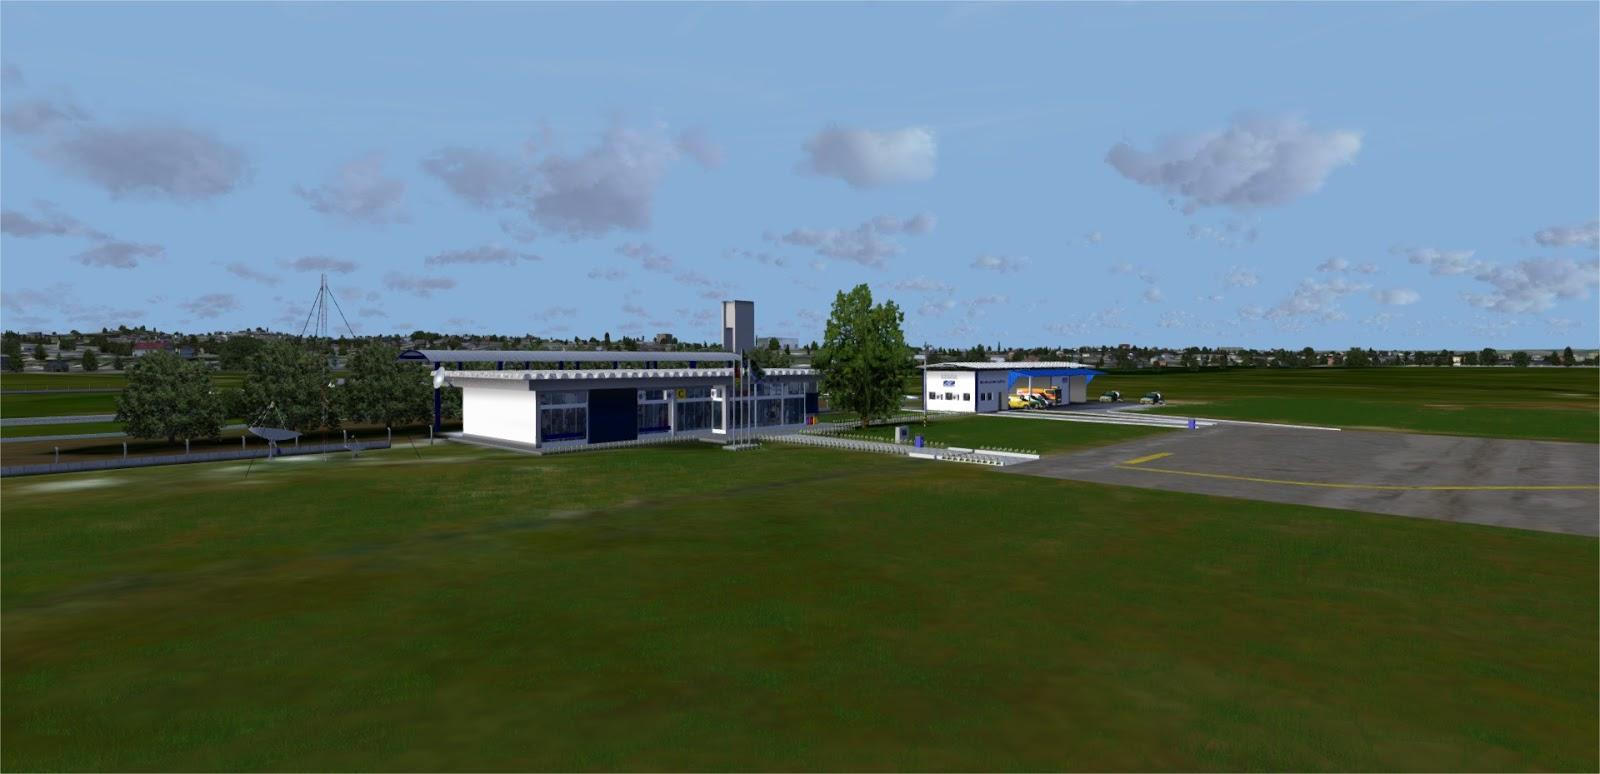 SBBGX2017 - Aeroporto ded Bagé FSX, Prepar3D vs 3, 4